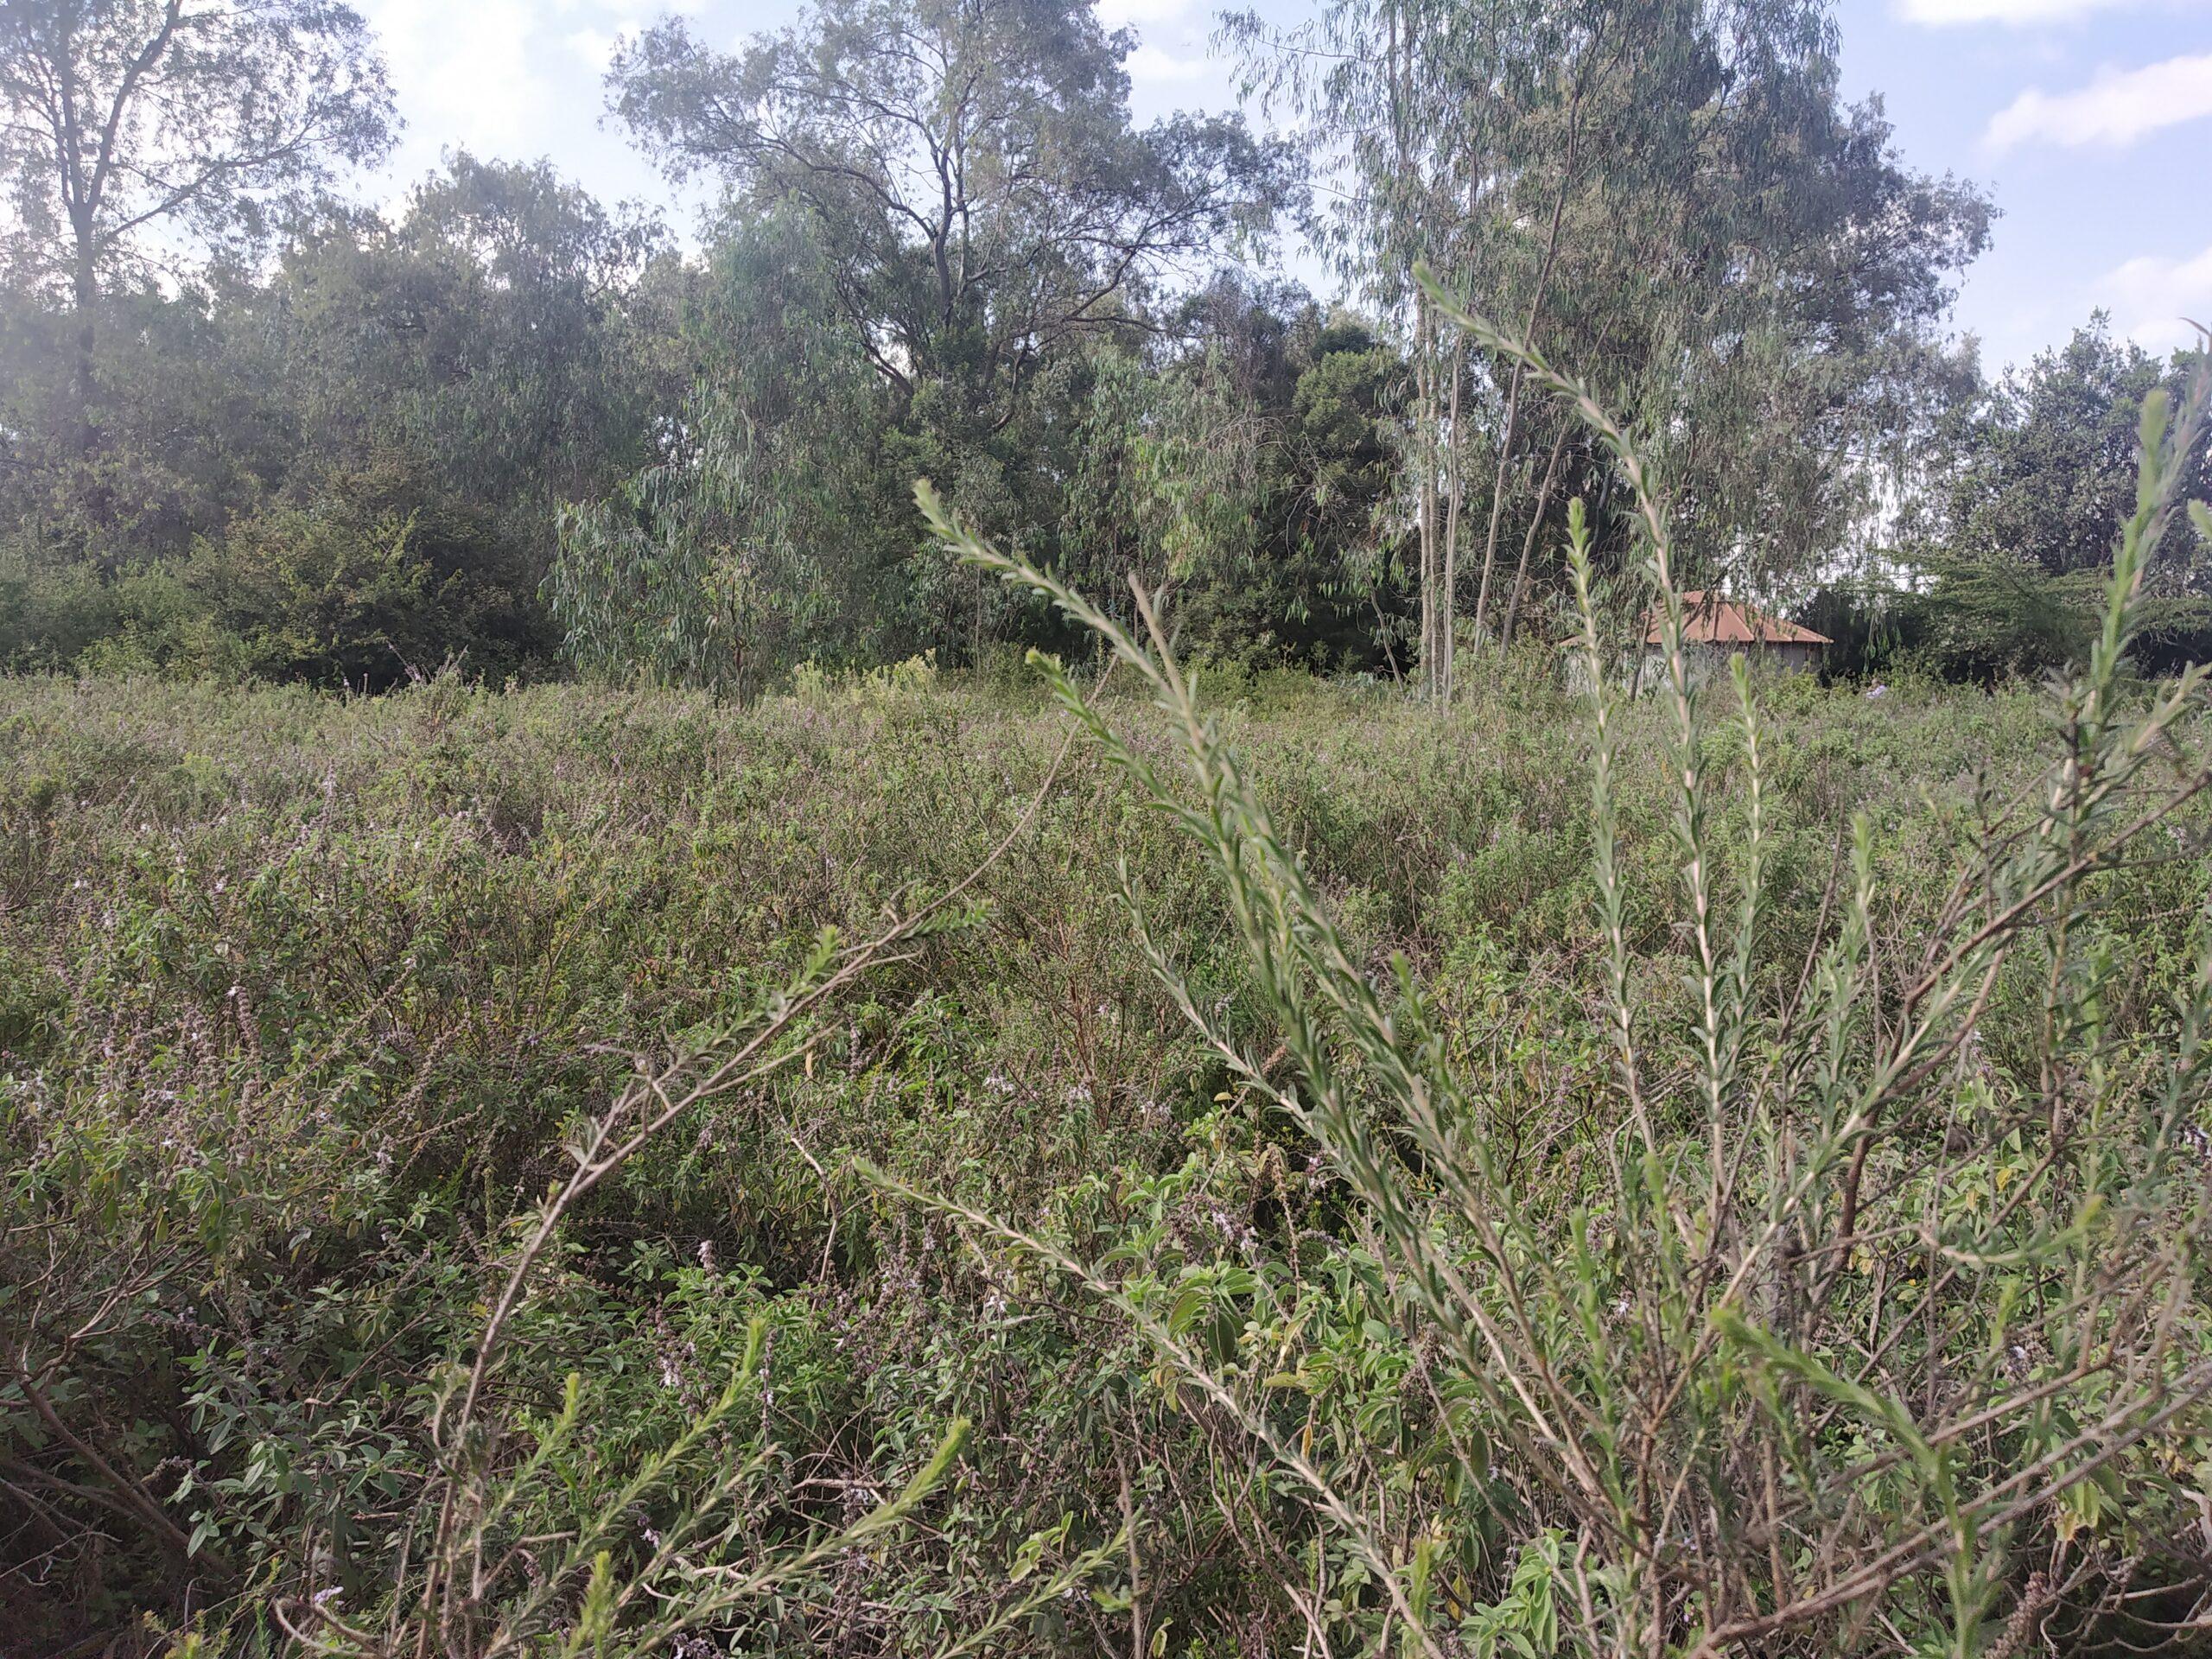 Five [5] Acres FOR SALE, Karen, Nairobi